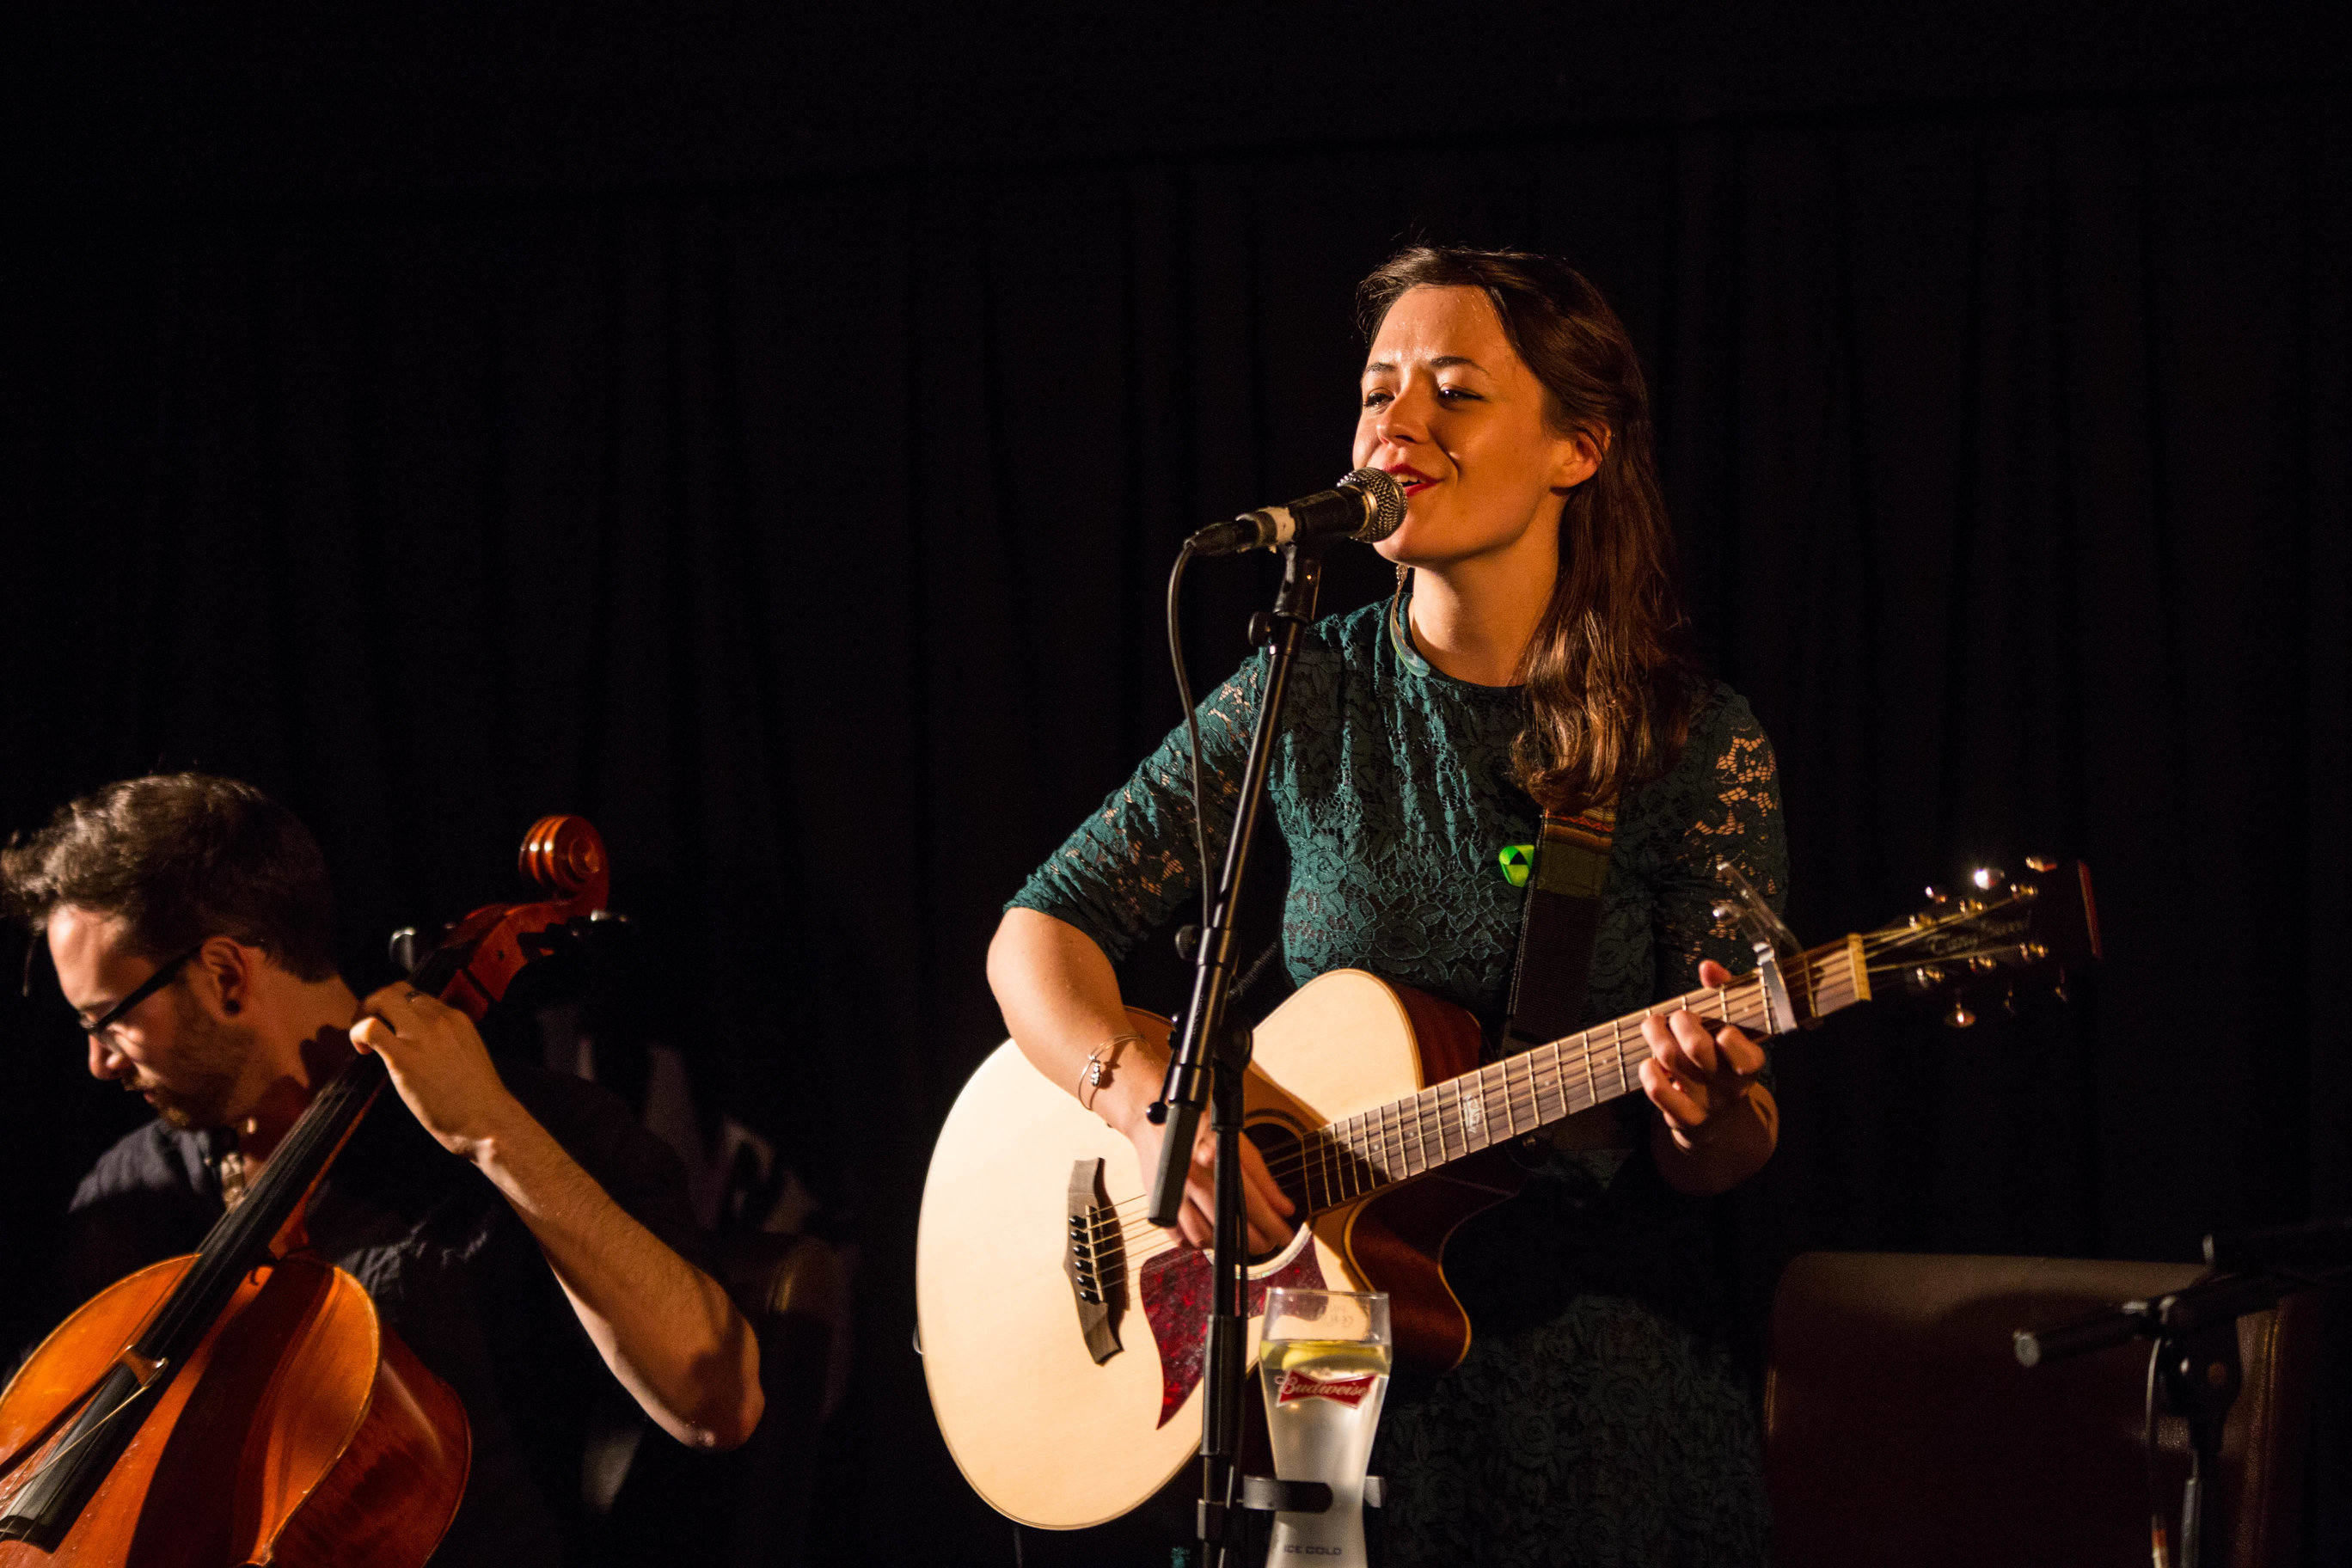 Emma Langford debuts EP at Dolans Limerick. Emma Langford Q&A